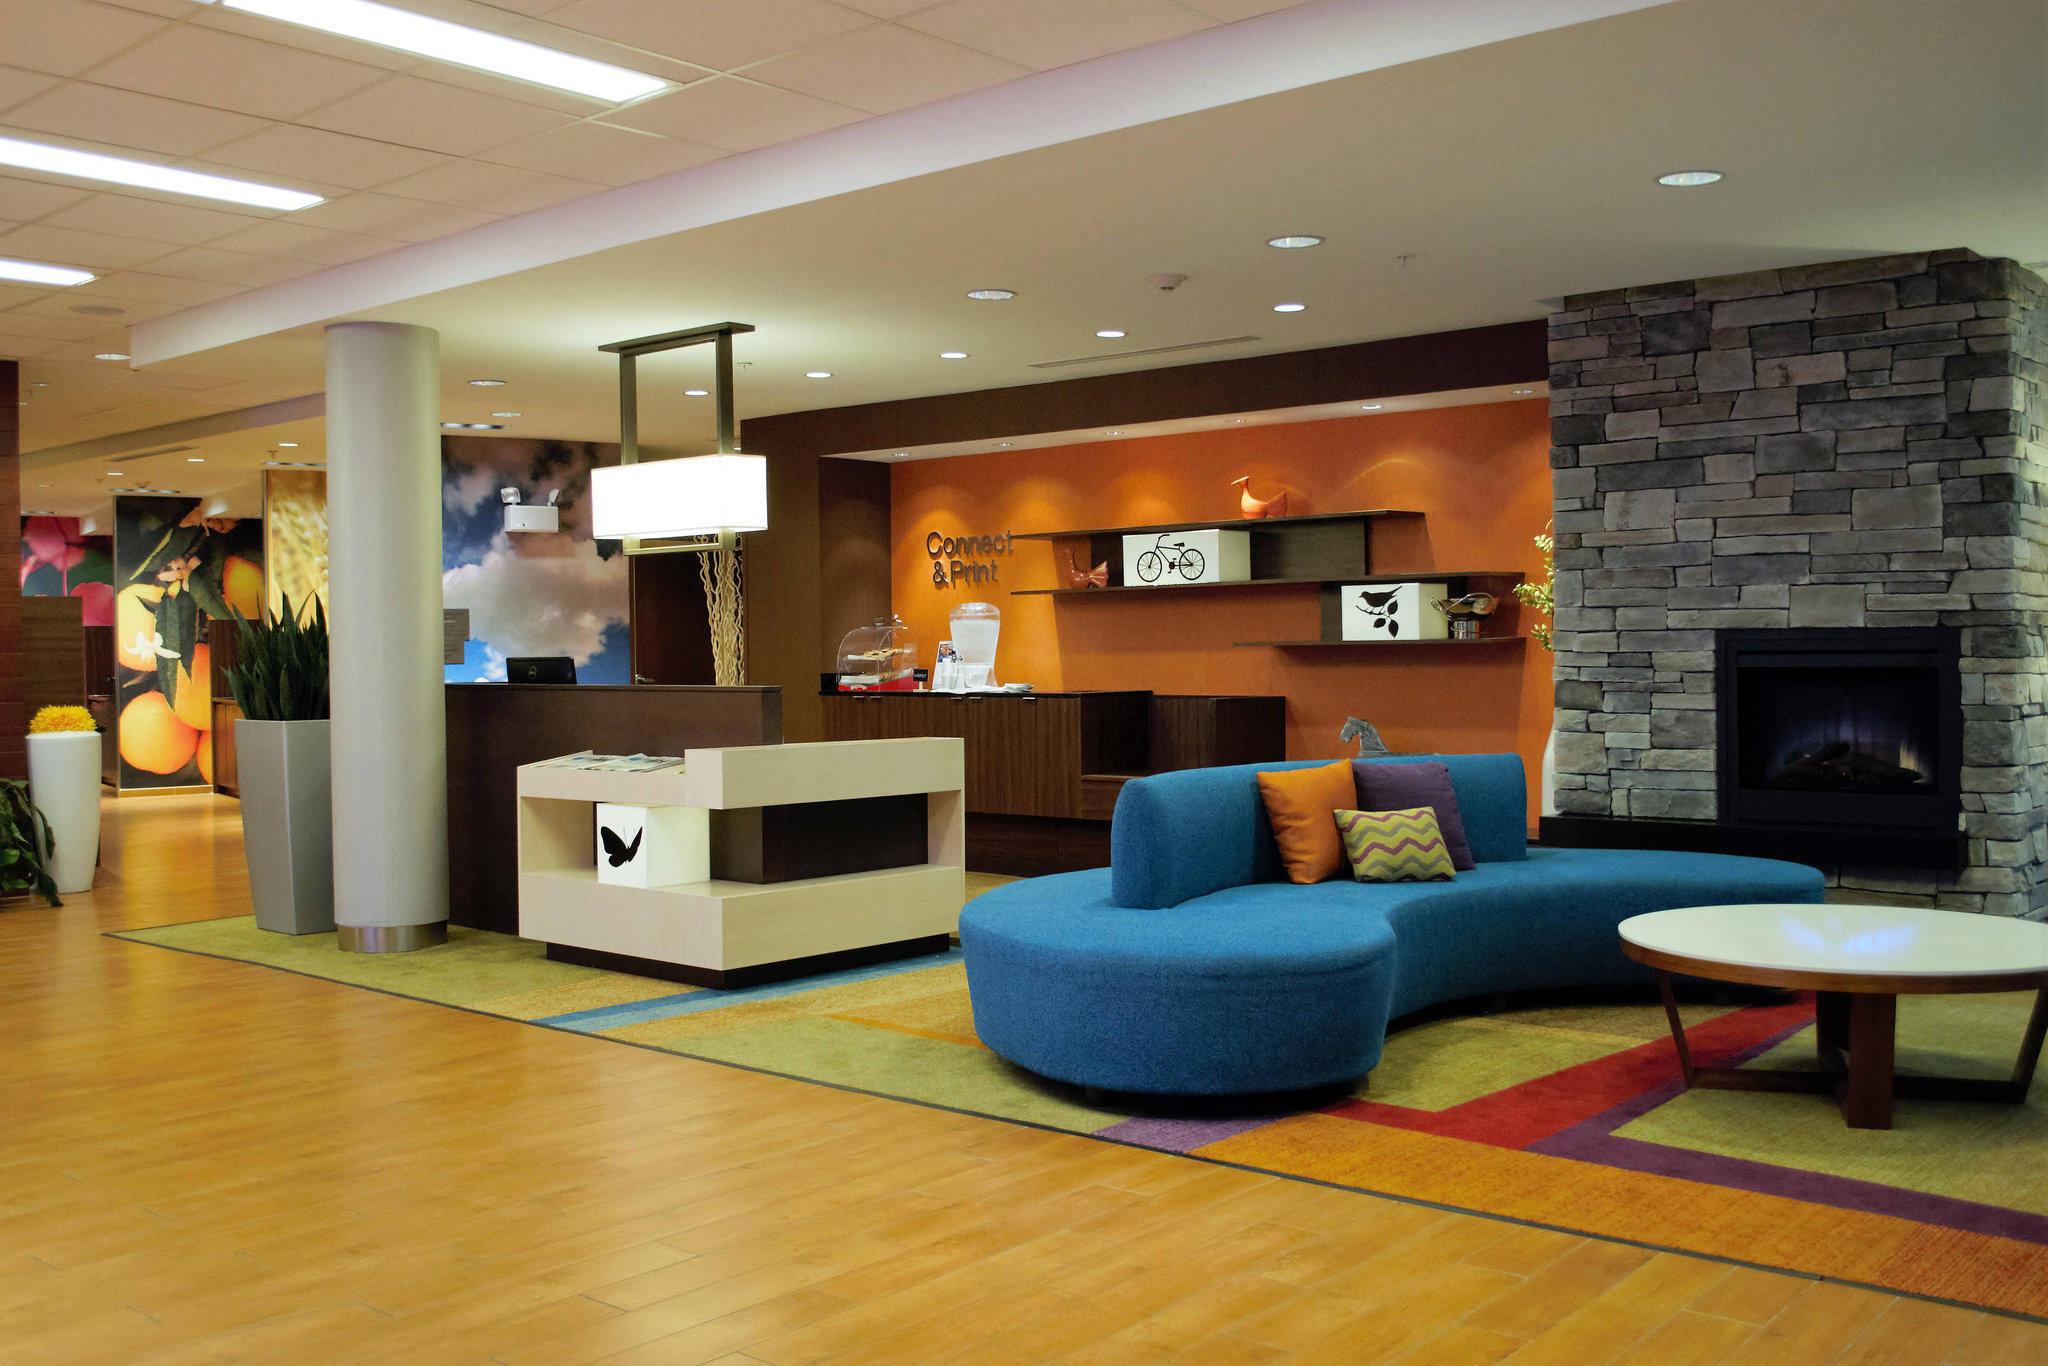 Fairfield Inn & Suites by Marriott Stroudsburg Bartonsville/Poconos